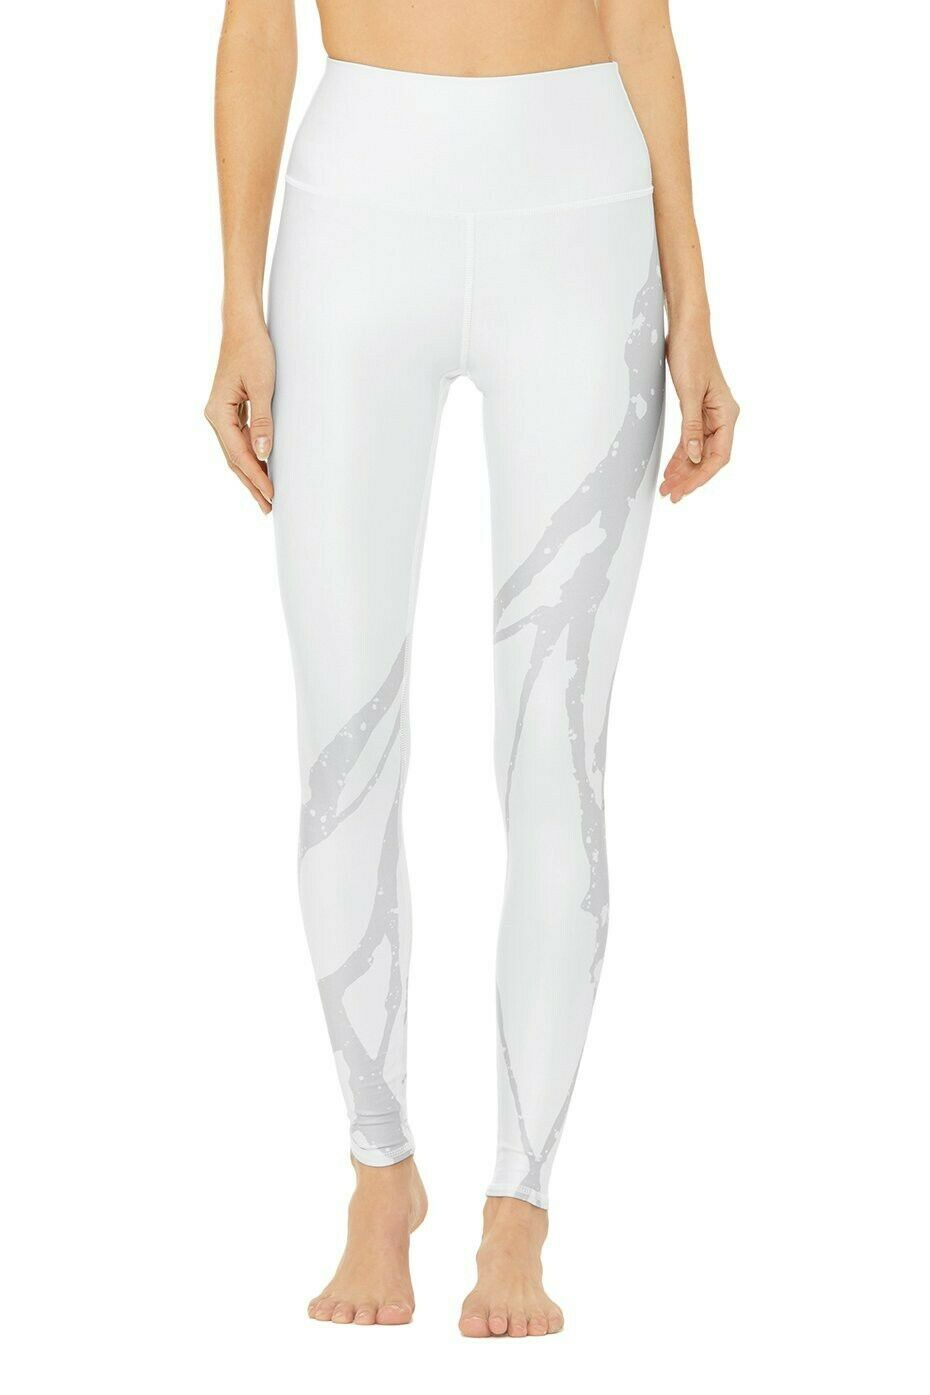 ALO Yoga WHITE ZUMA Airbrush Leggings-high Waist-Size Small